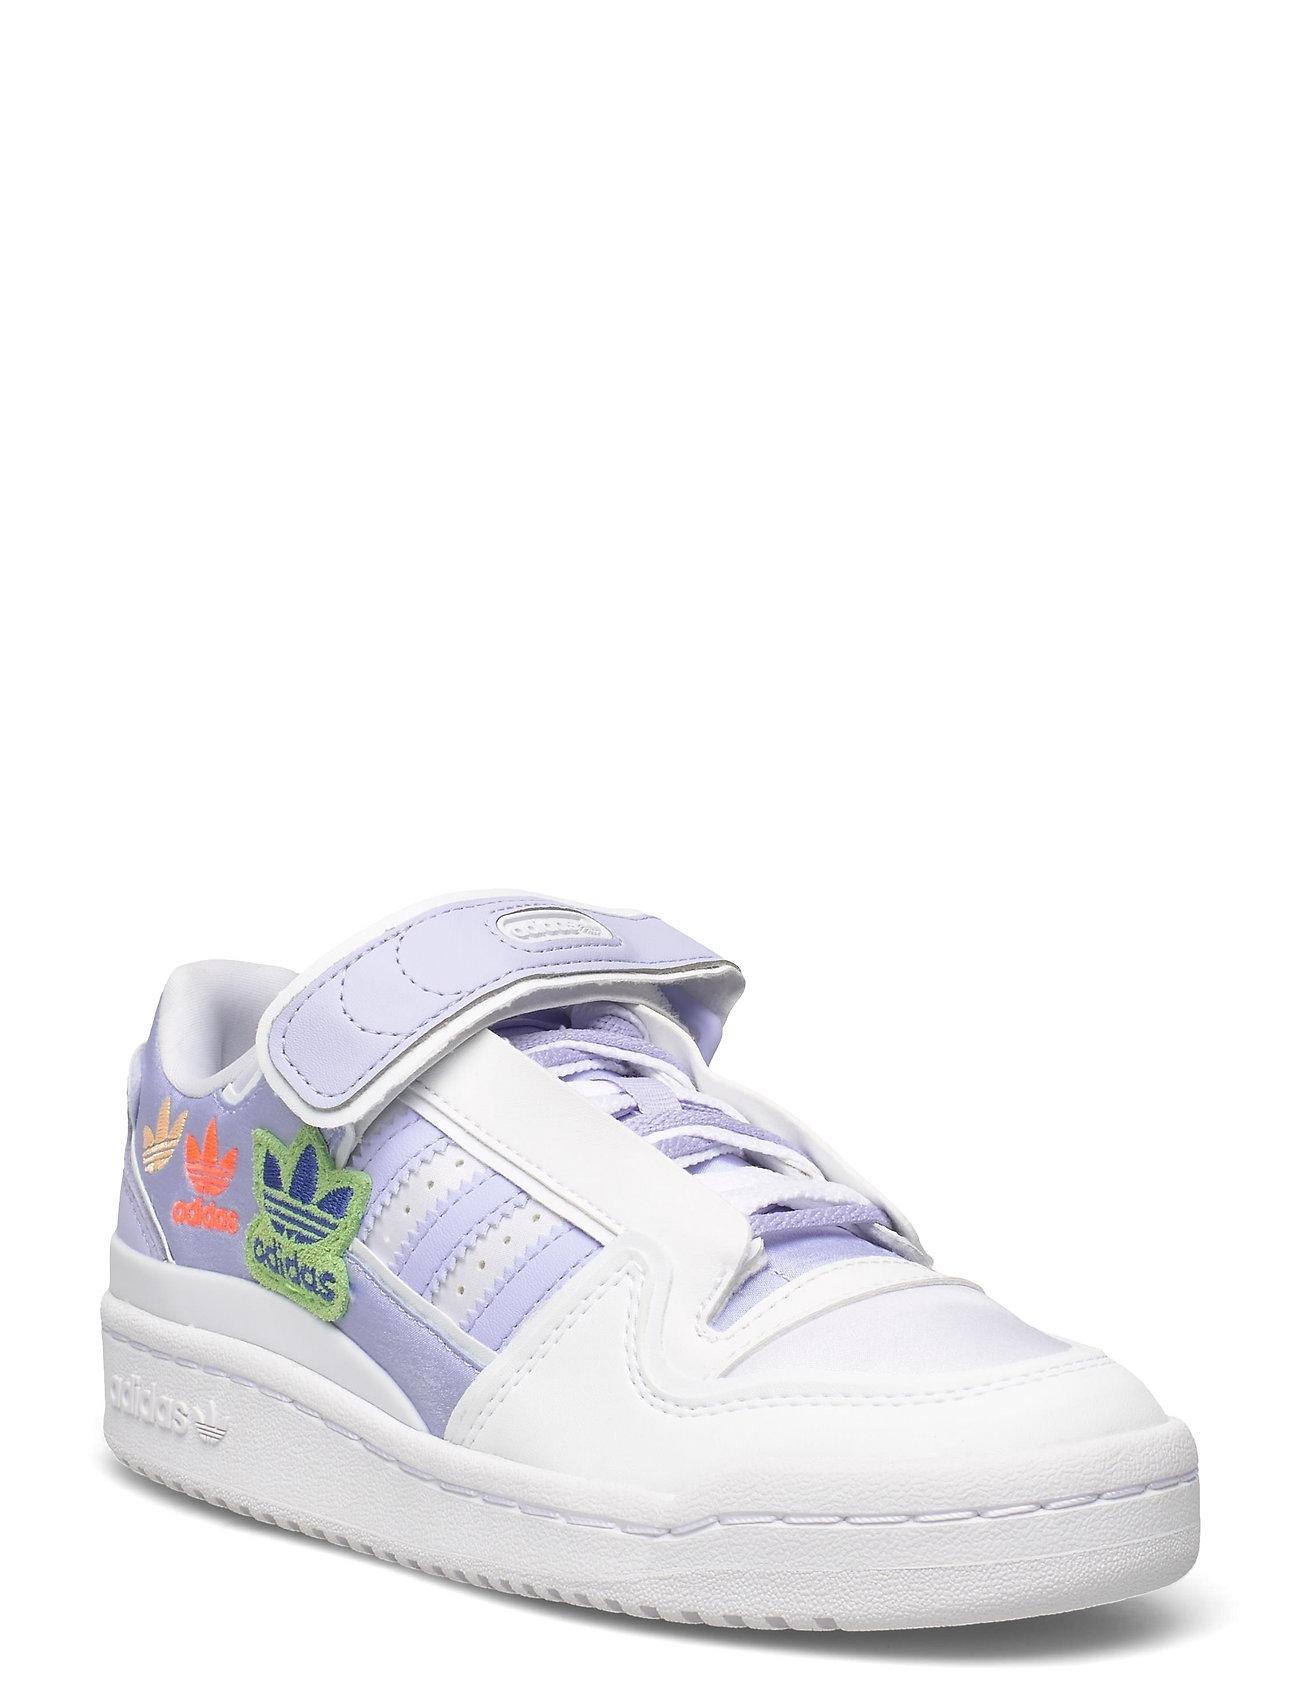 Forum Plus W Low-top Sneakers Hvid Adidas Originals